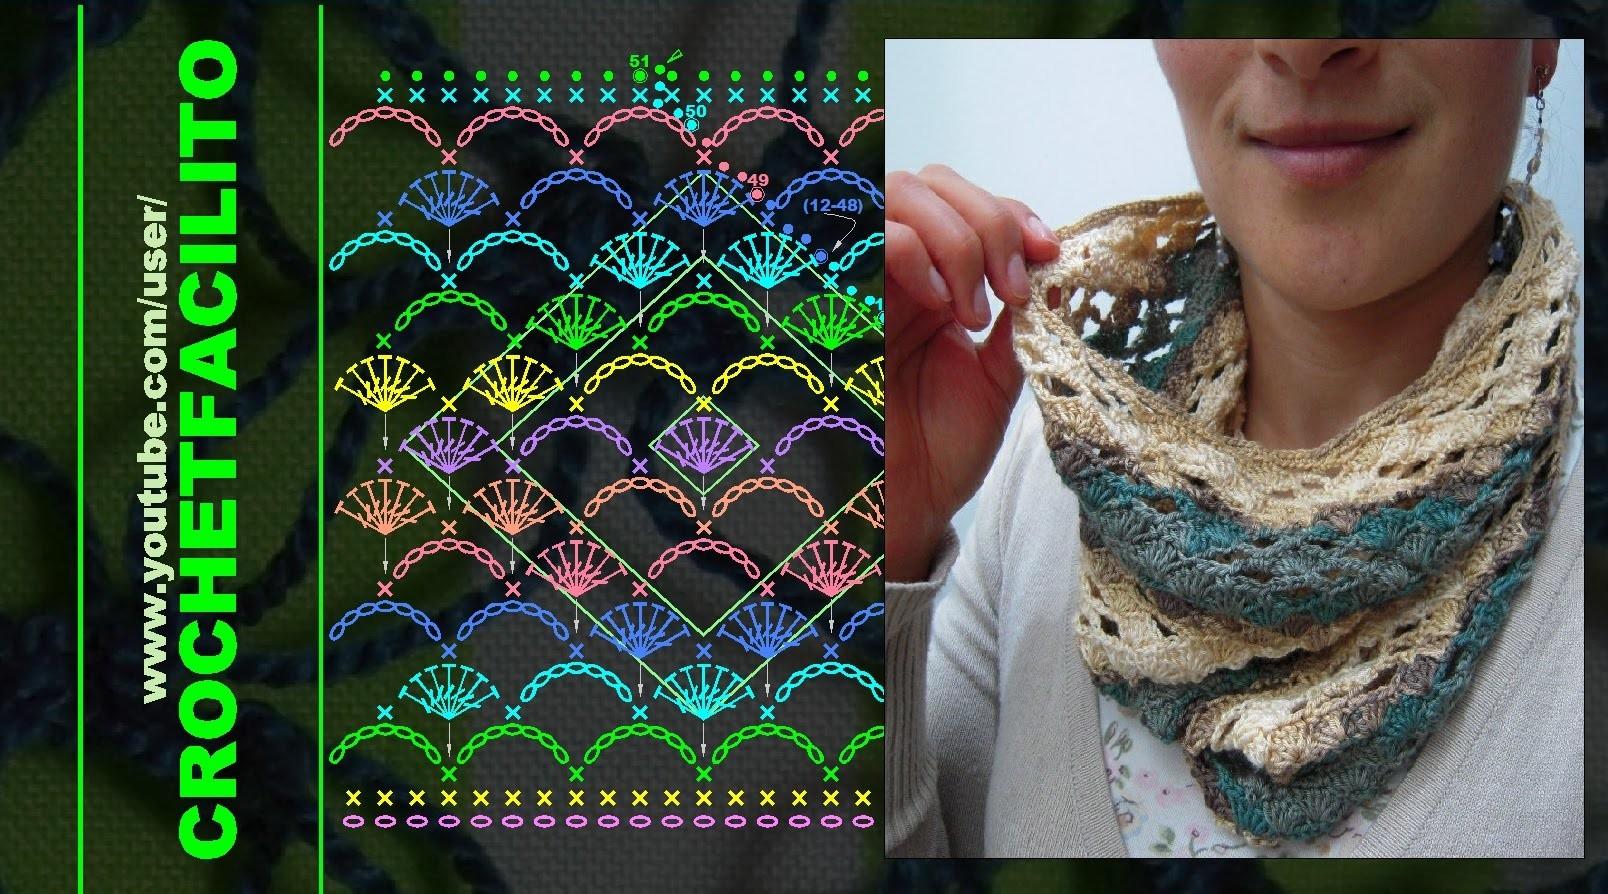 CROCHET - 16.  UN CUELLITO CALENTADOR CON DIAMANTES - A DIAMOND STITCH NECK WARMER !!